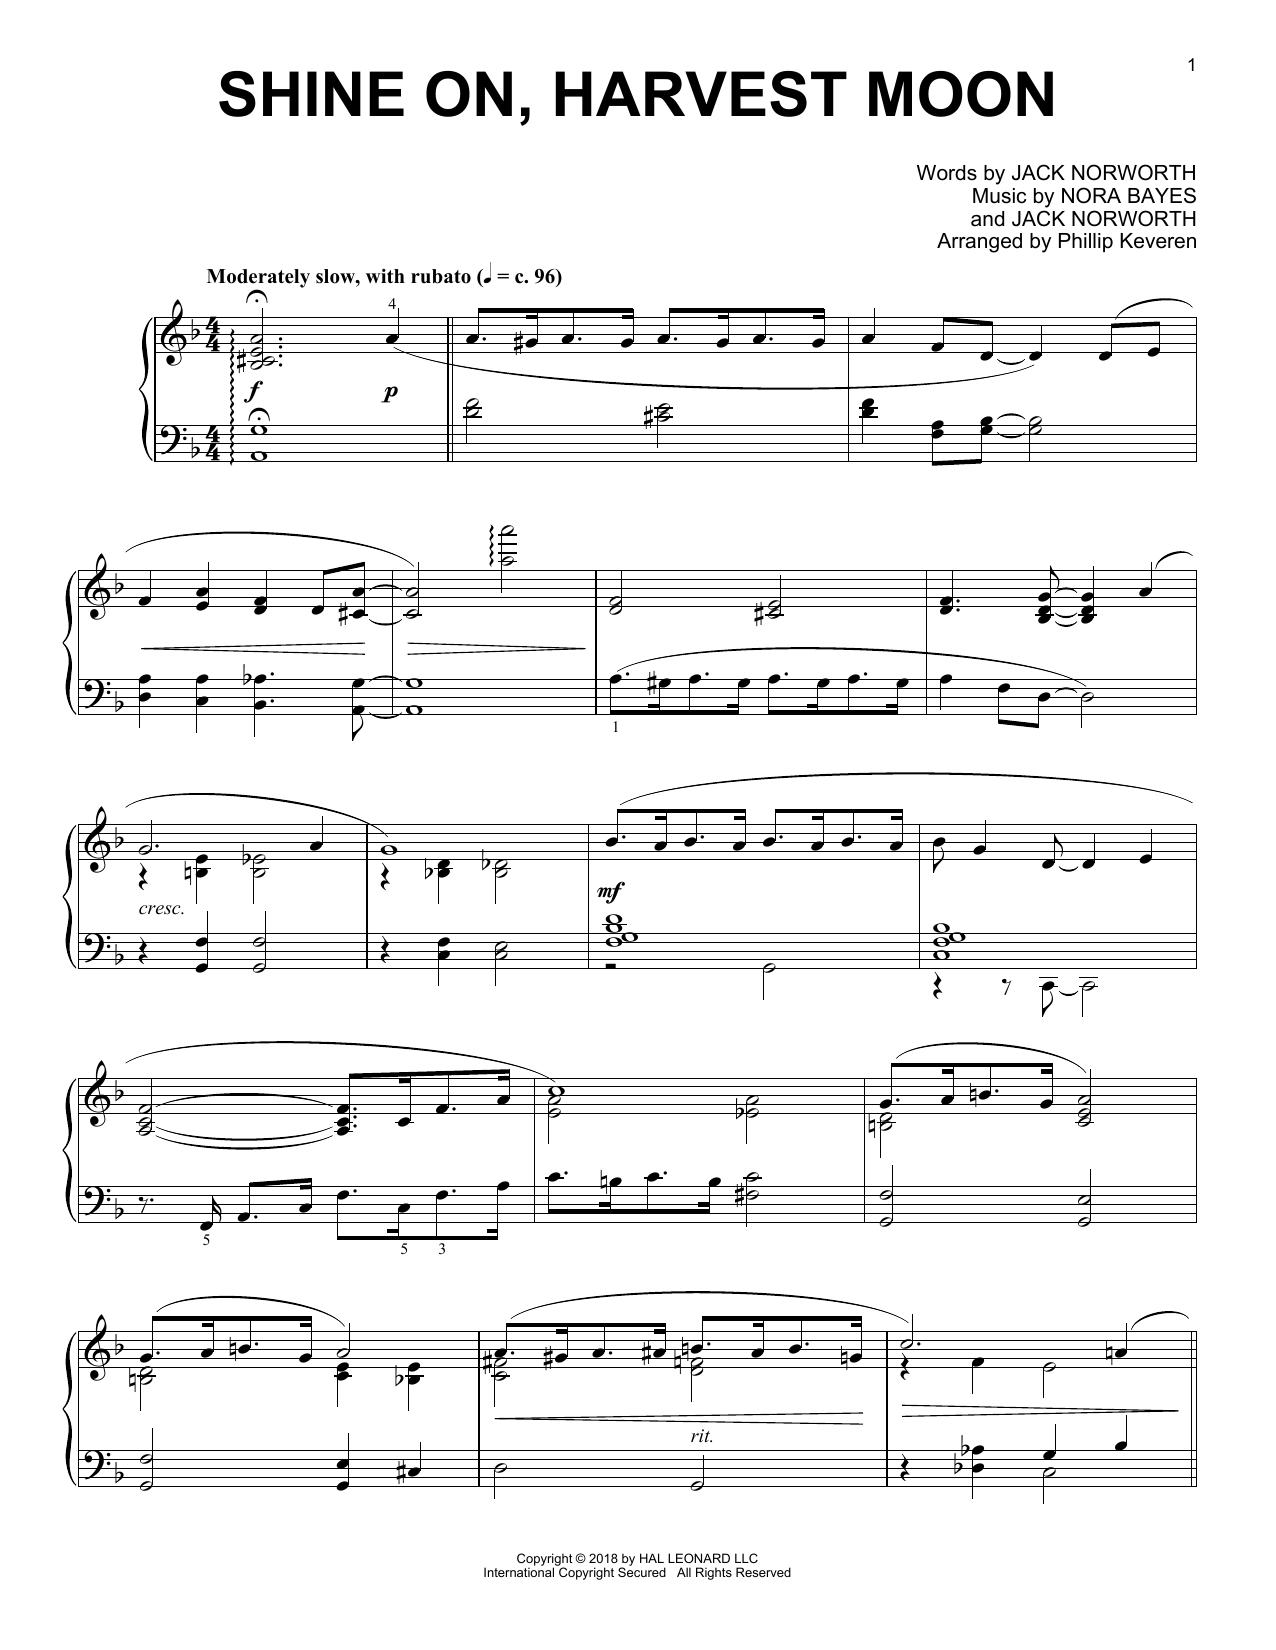 Jack Norworth Shine On, Harvest Moon [Jazz version] (arr. Phillip Keveren) sheet music notes and chords. Download Printable PDF.